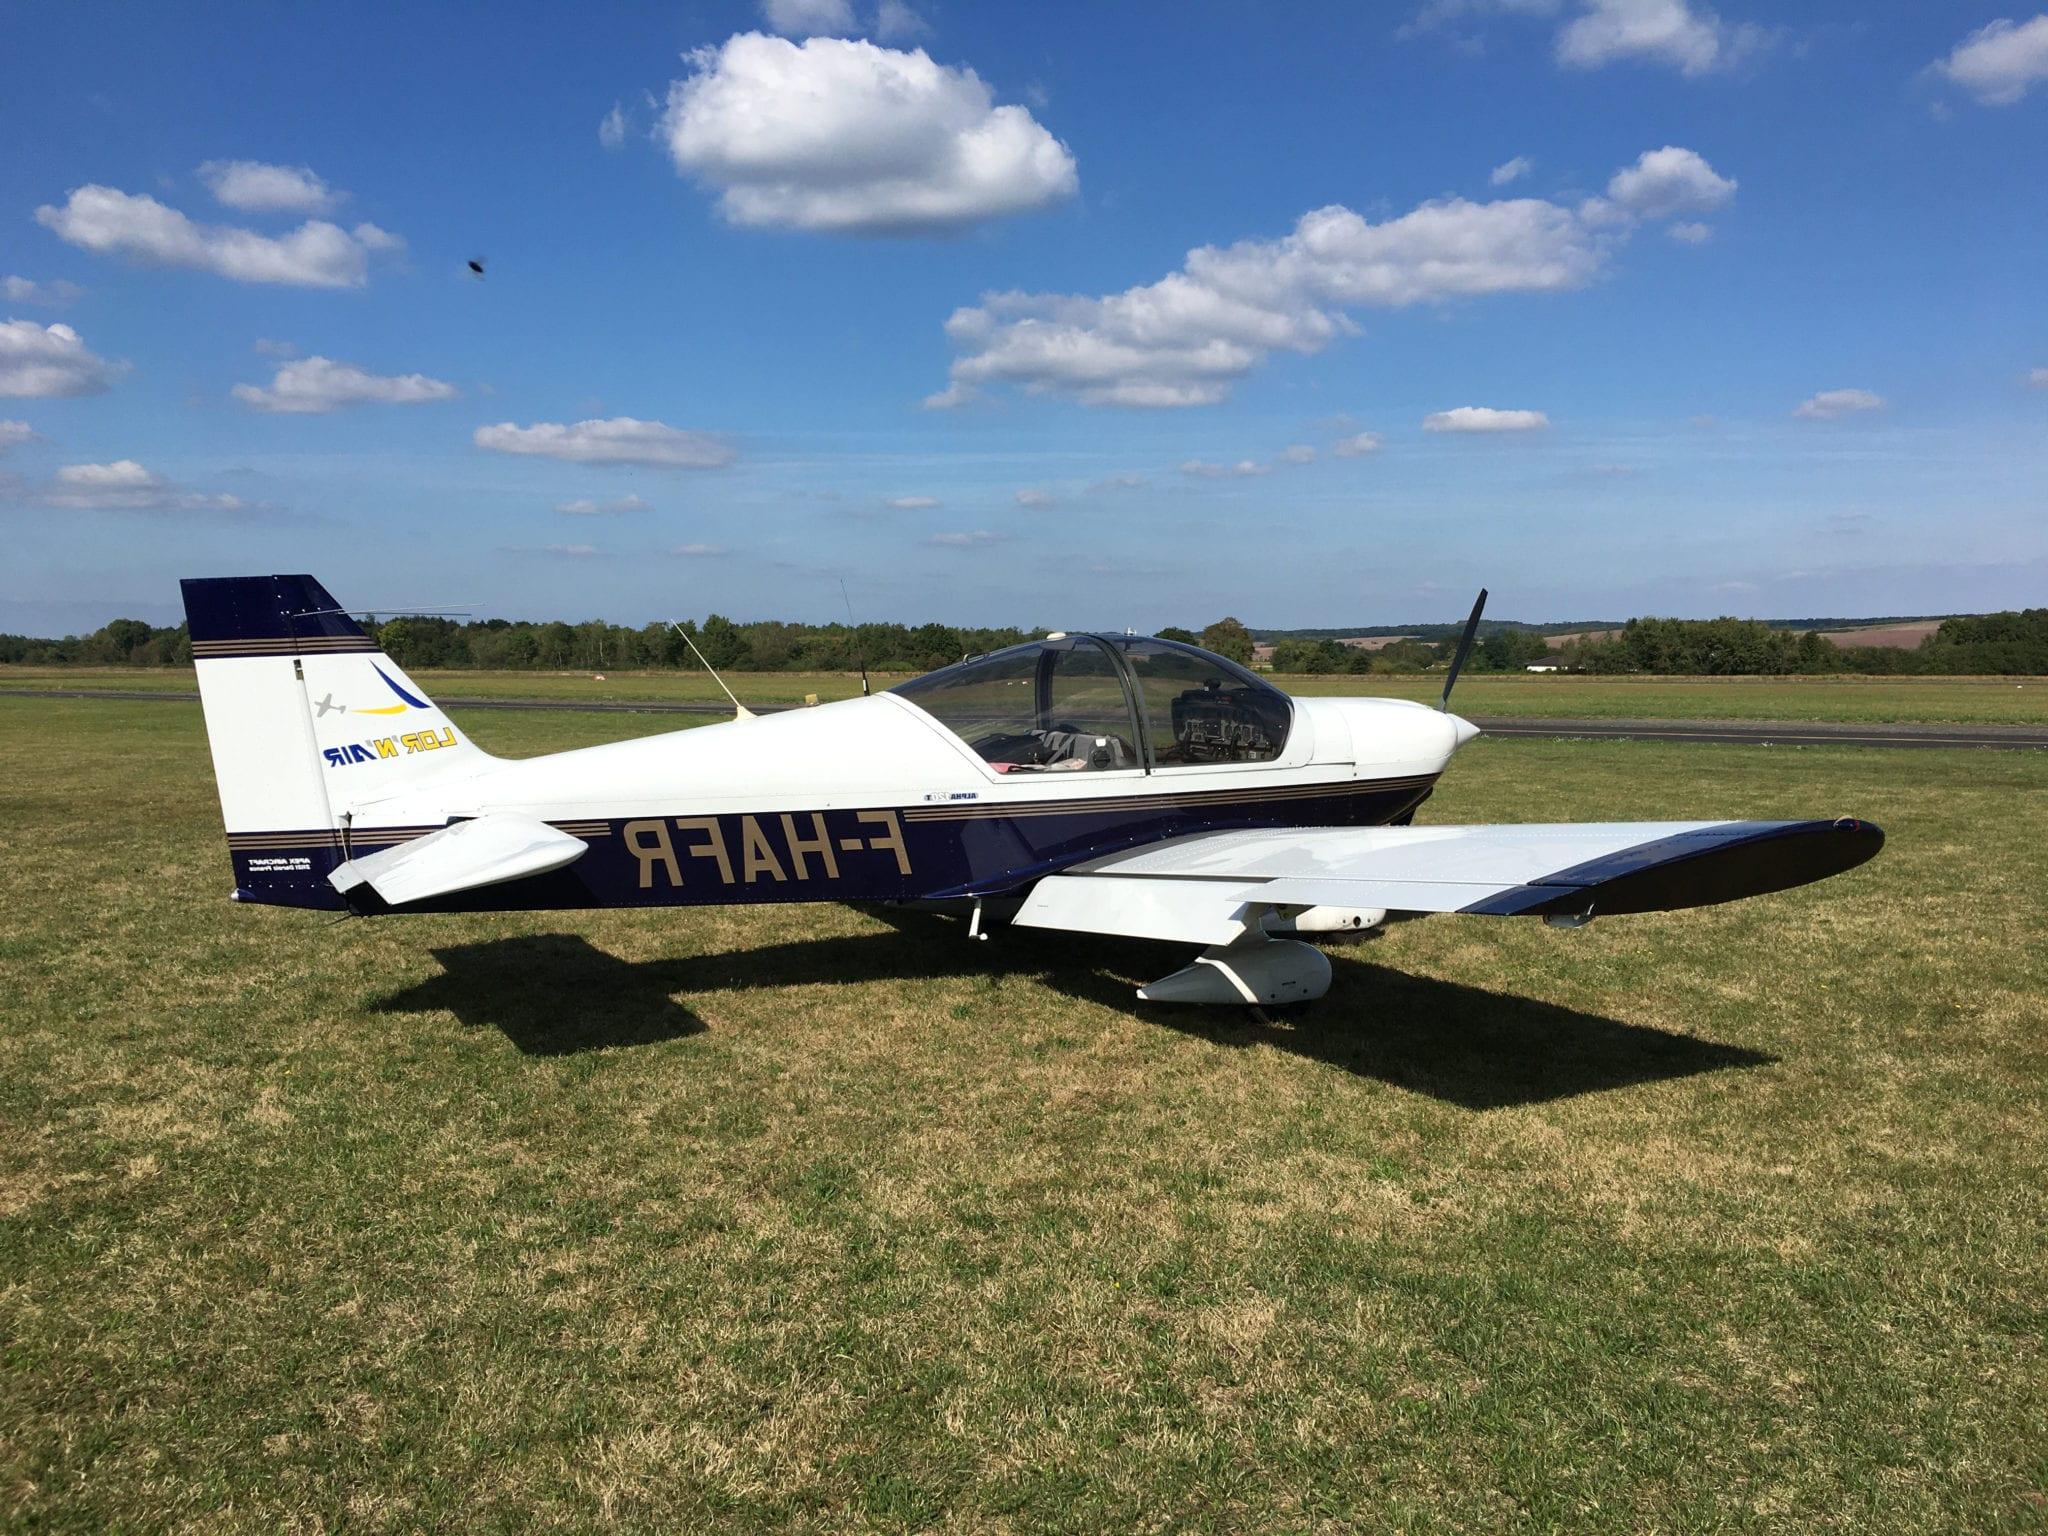 avion robin alpha 120 biplace tourisme lorraine nancy pilotage